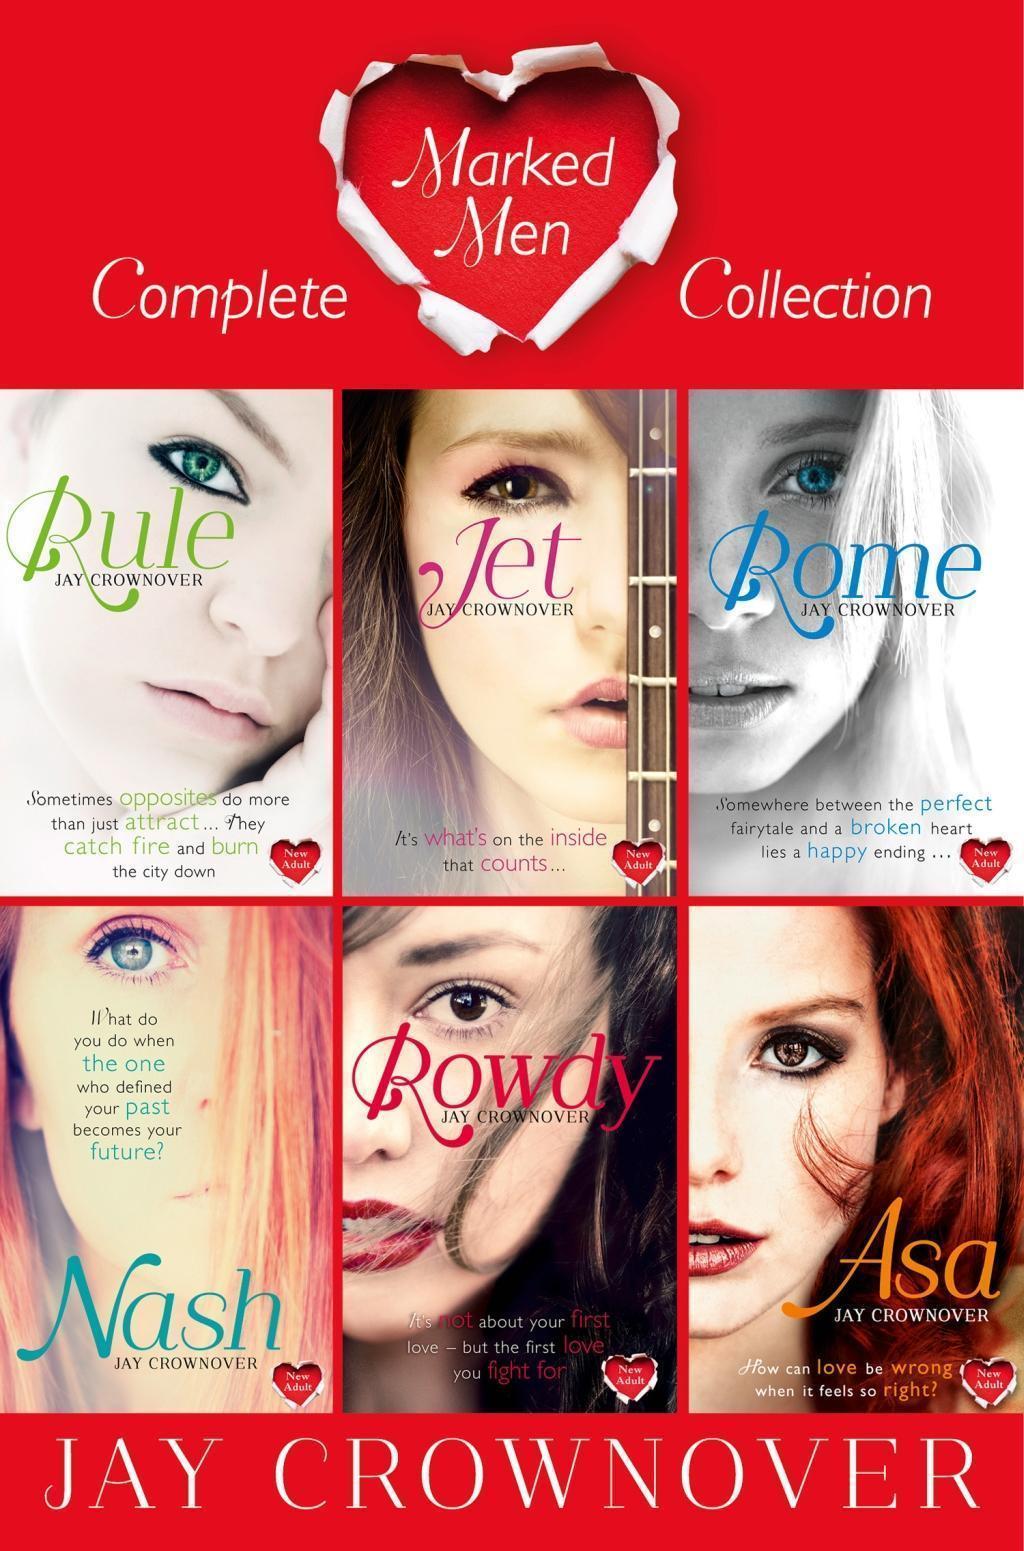 The Marked Men Series Books 1-6: Rule, Jet, Rome, Nash, Rowdy, Asa